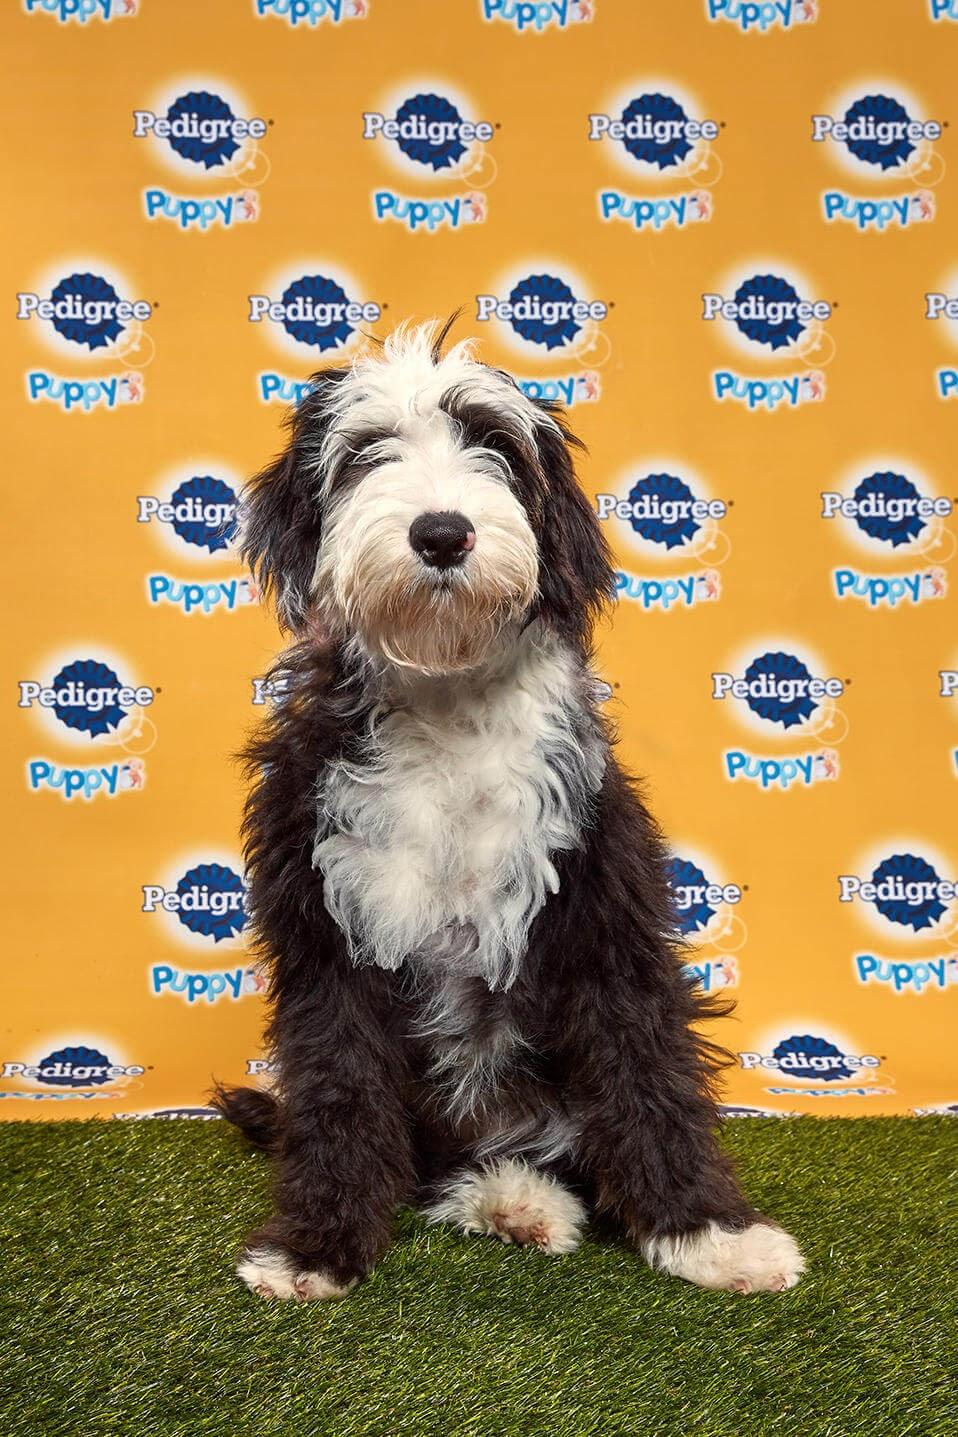 Candy dog - Animal Planet